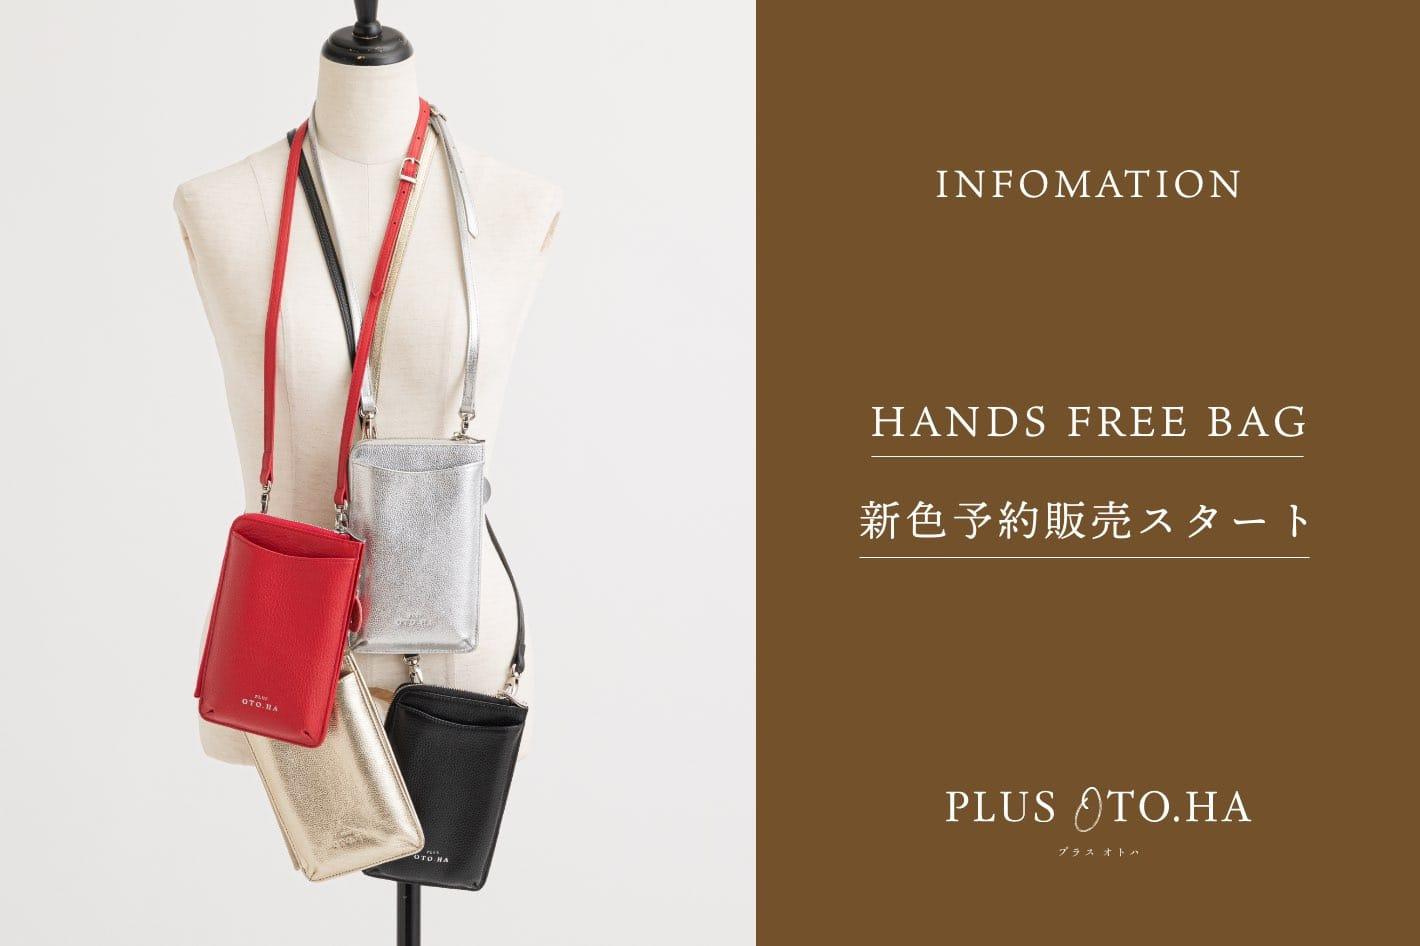 PLUS OTO.HA 【PLUS OTO.HA RECOMMEND ITEM】OTONA HANDS FREE BAG新色予約販売スタート!